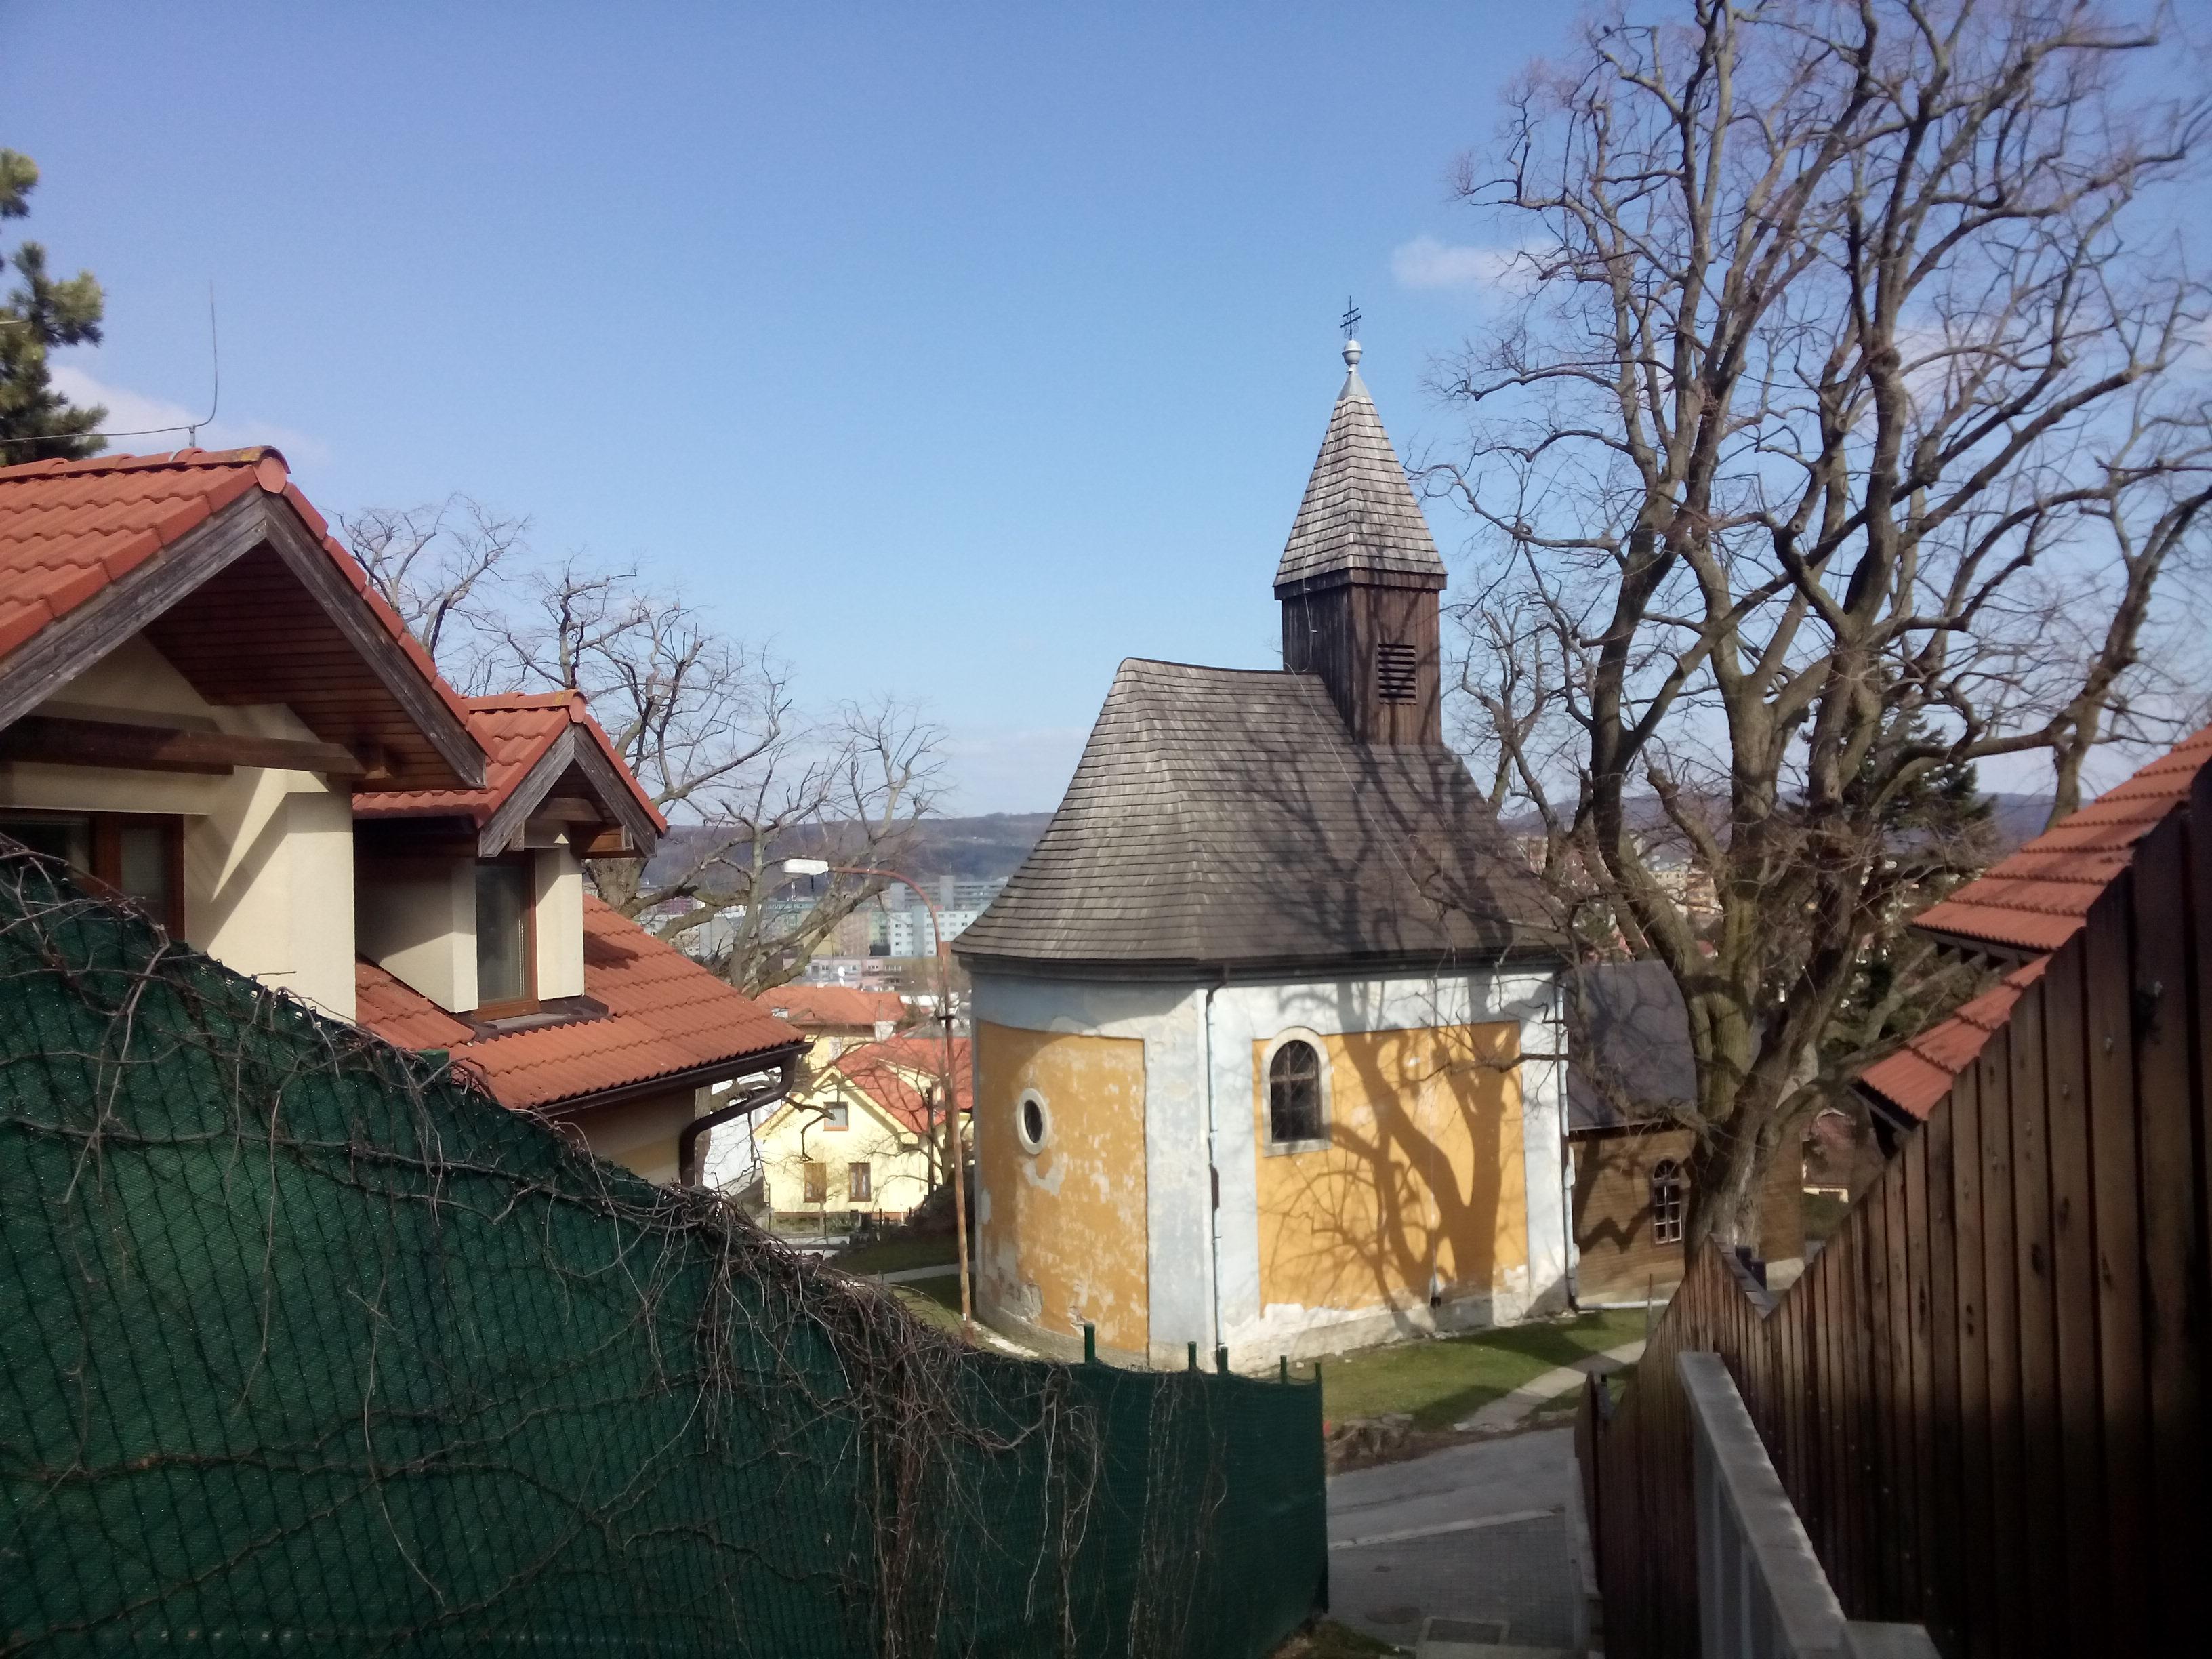 https://i.amy.gy/201804-slovakia-austria-czech/IMG_20180406_153047.jpg